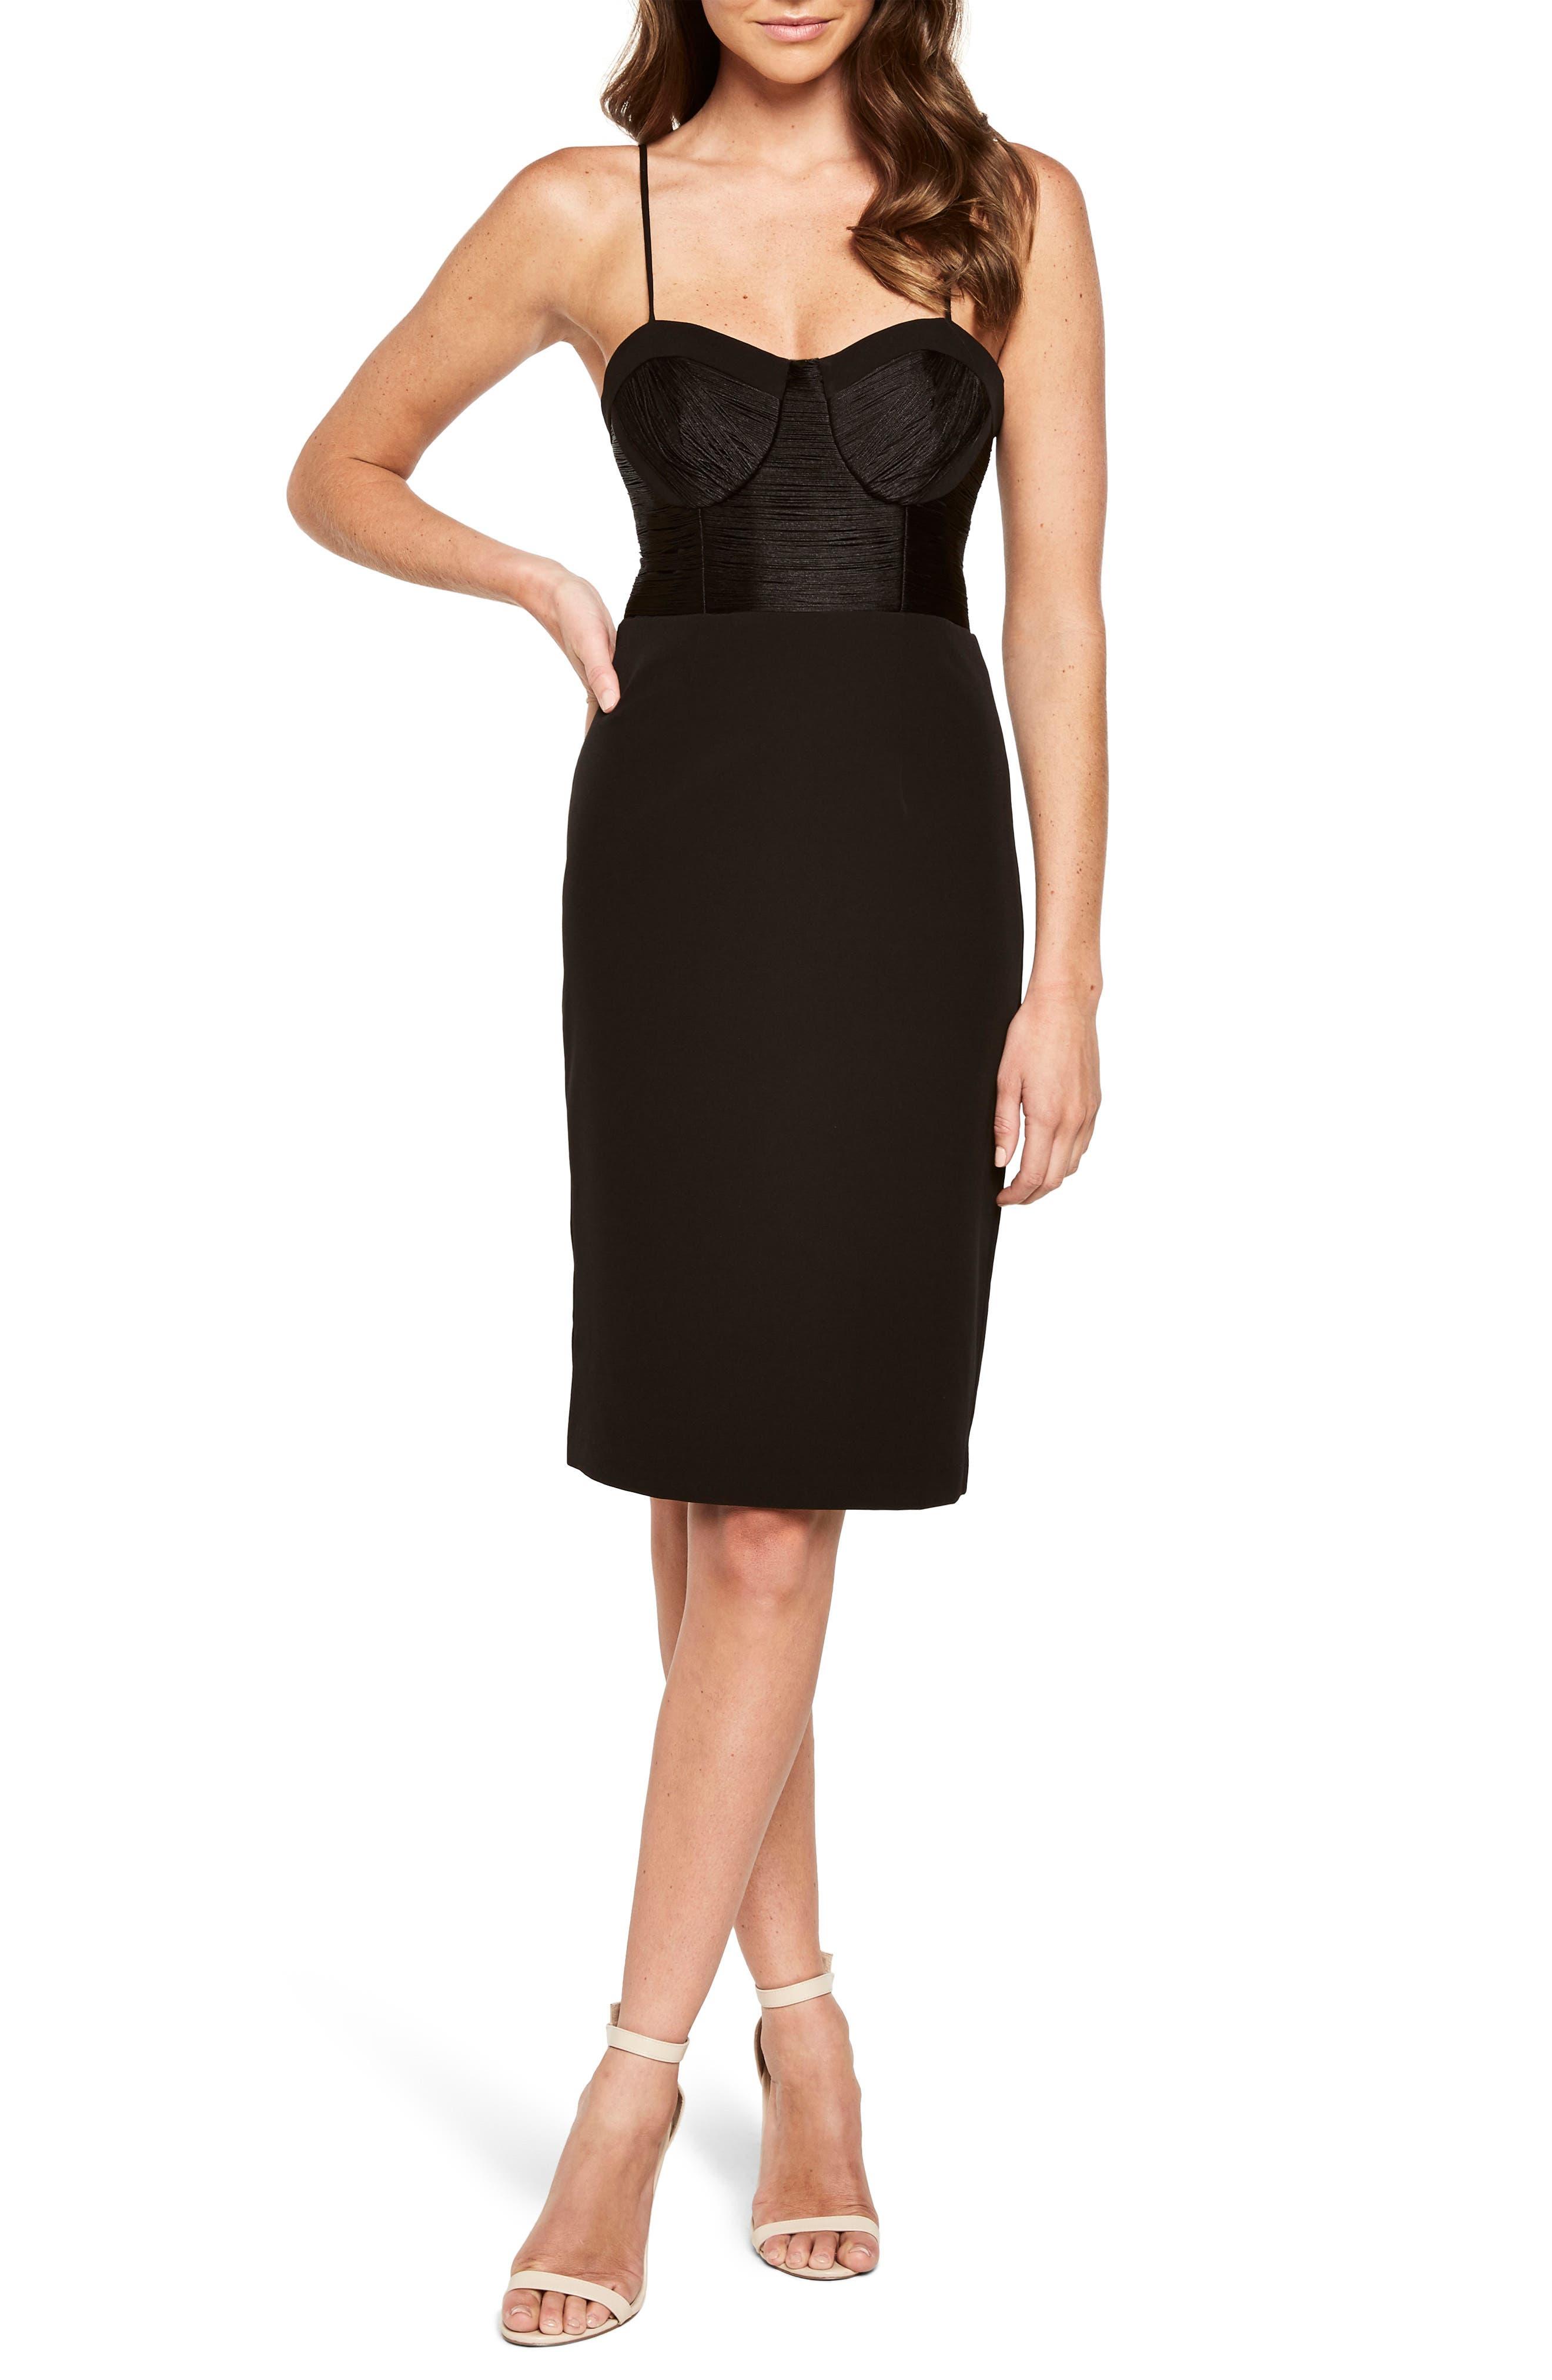 Freida Fringe Sheath Dress,                         Main,                         color, Black